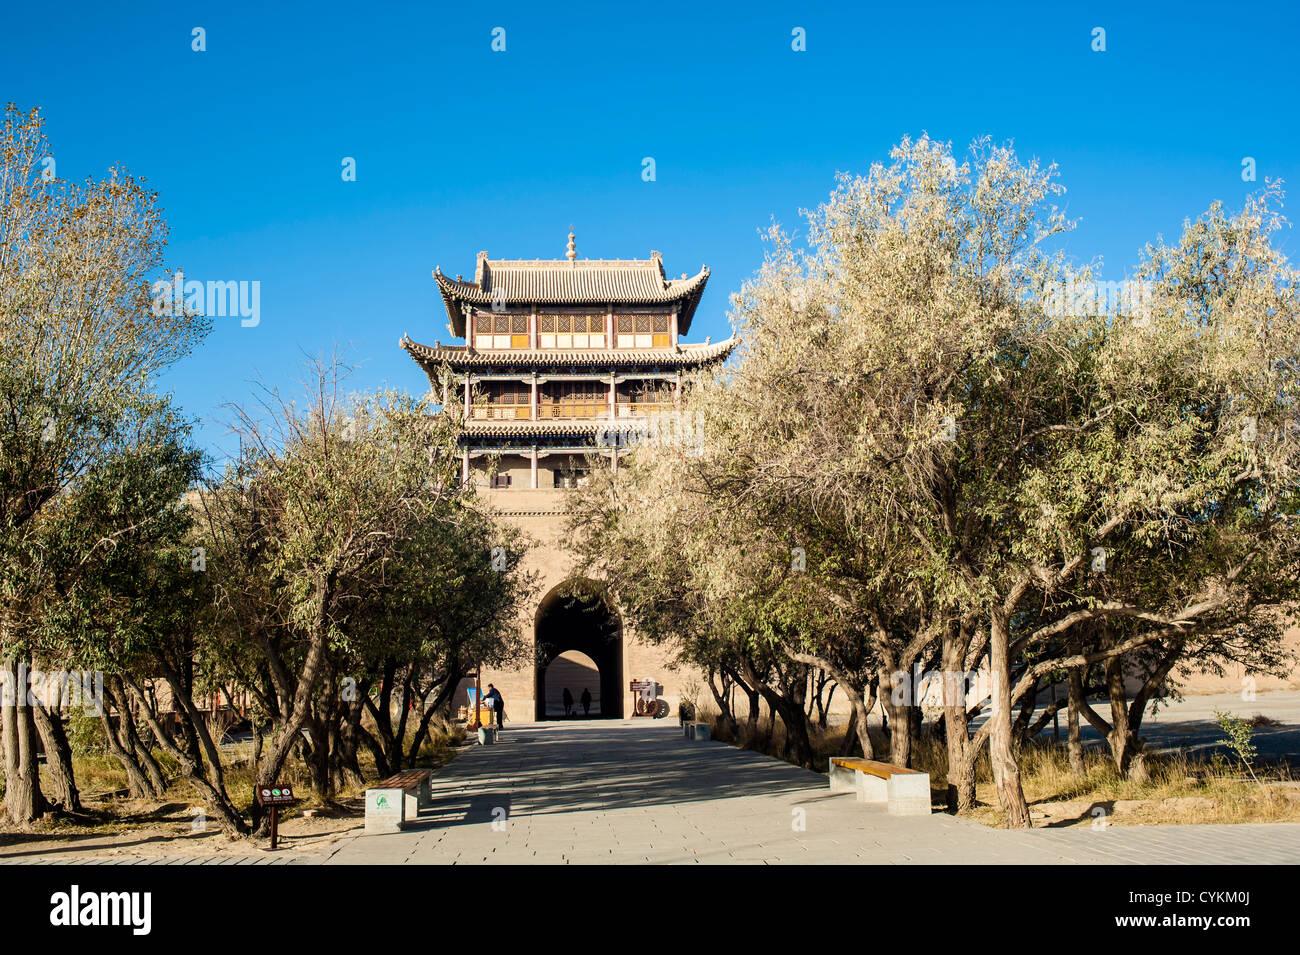 Inside of Jiayuguan castle, Jiayuguan city, China - Stock Image